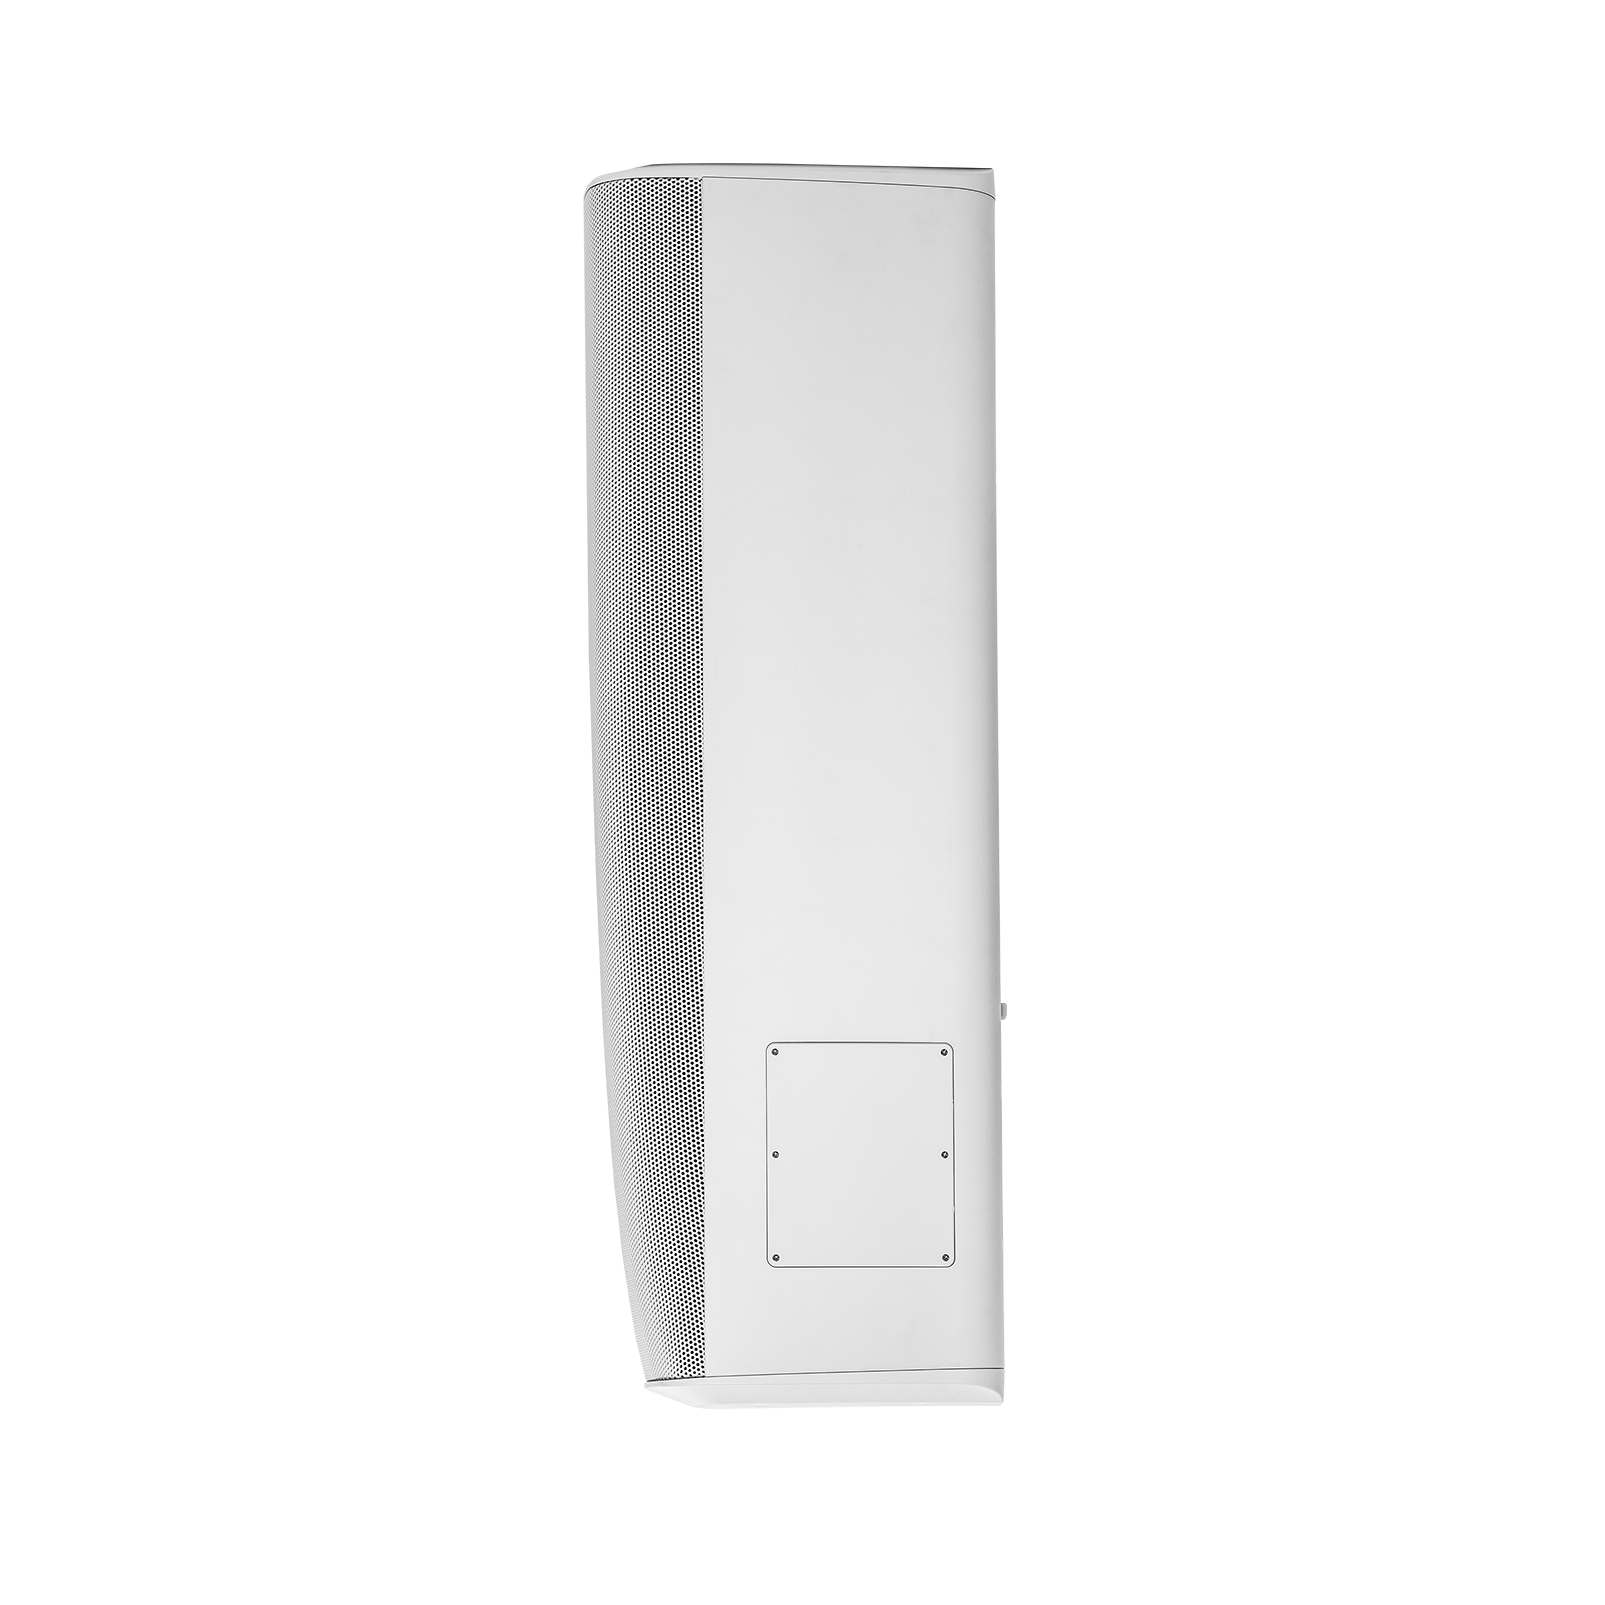 JBL CBT 1000 (B-Stock) - White - Constant Beamwidth Technology ™ Adjustable Coverage Line Array Column - Left